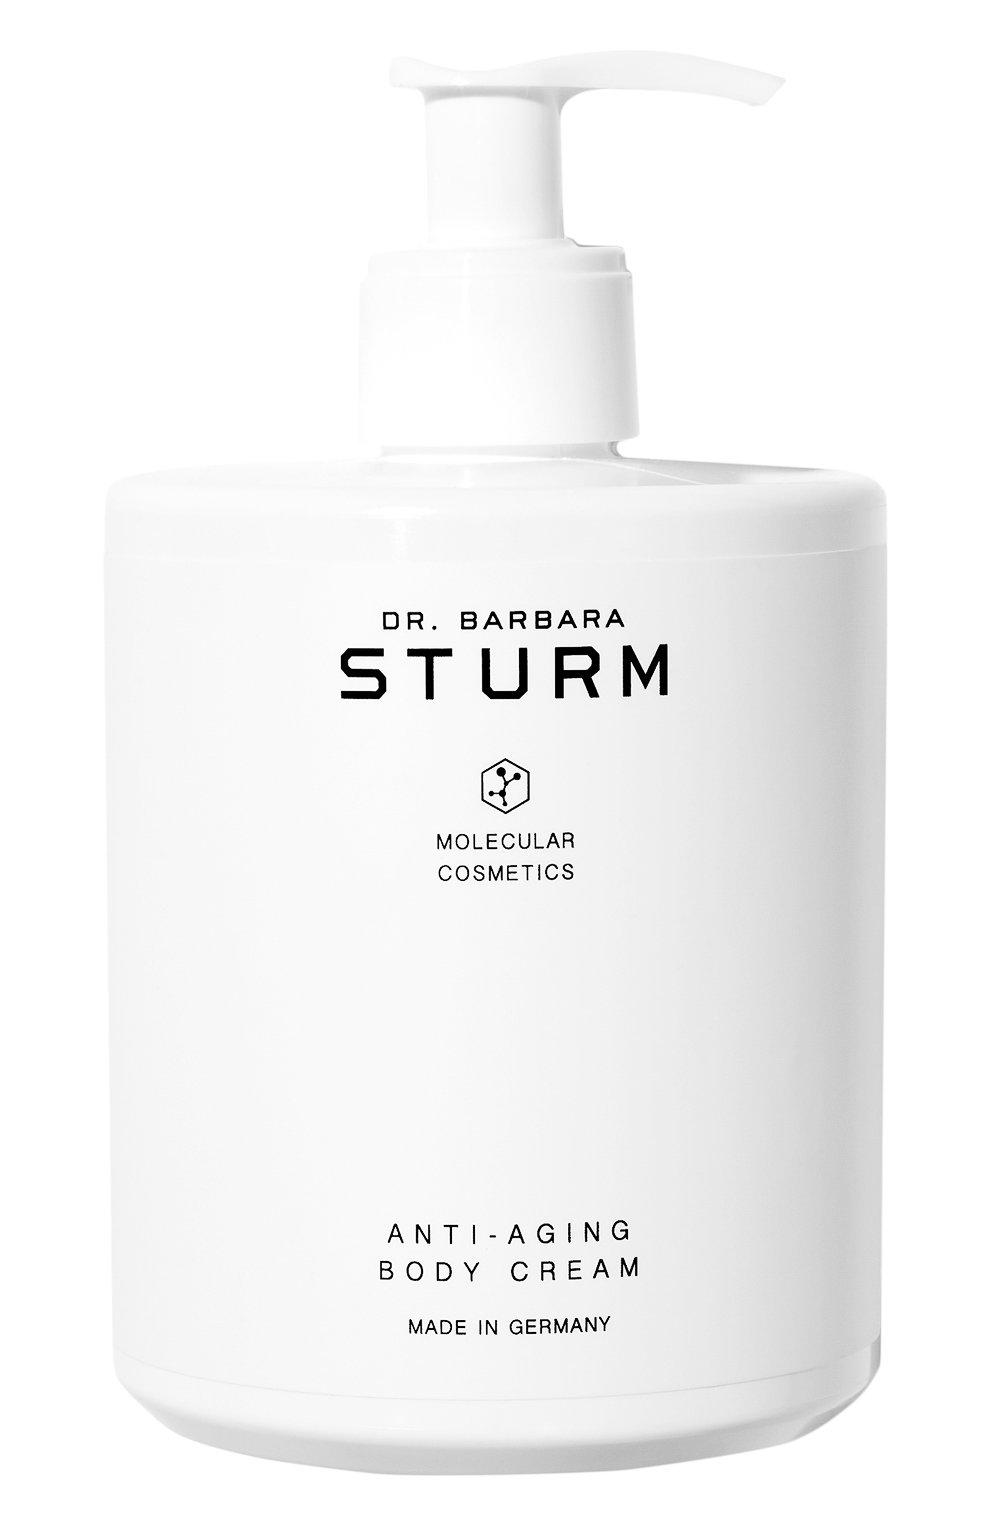 Увлажняющий крем для тела для упругости и эластичности кожи Dr. Barbara Sturm | Фото №1